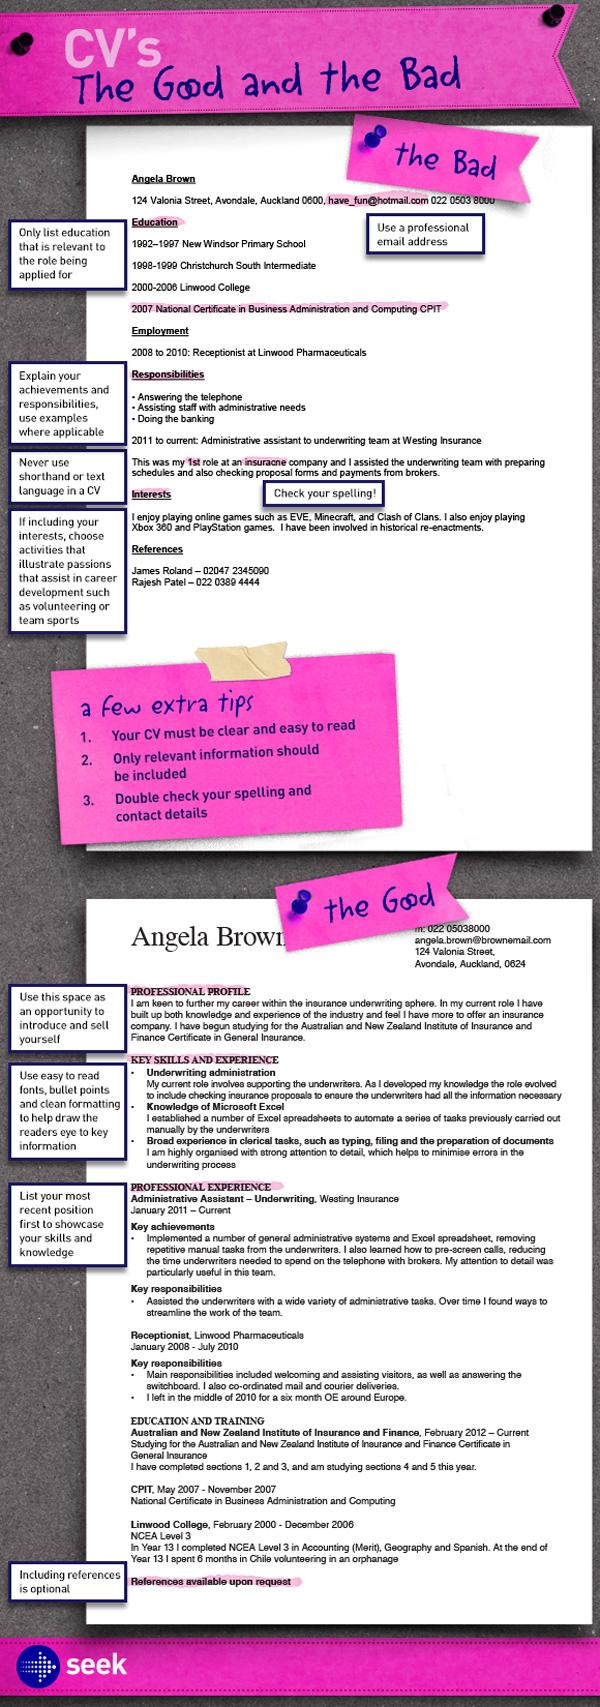 CV's The Good And The Bad Career Advice Hub SEEK